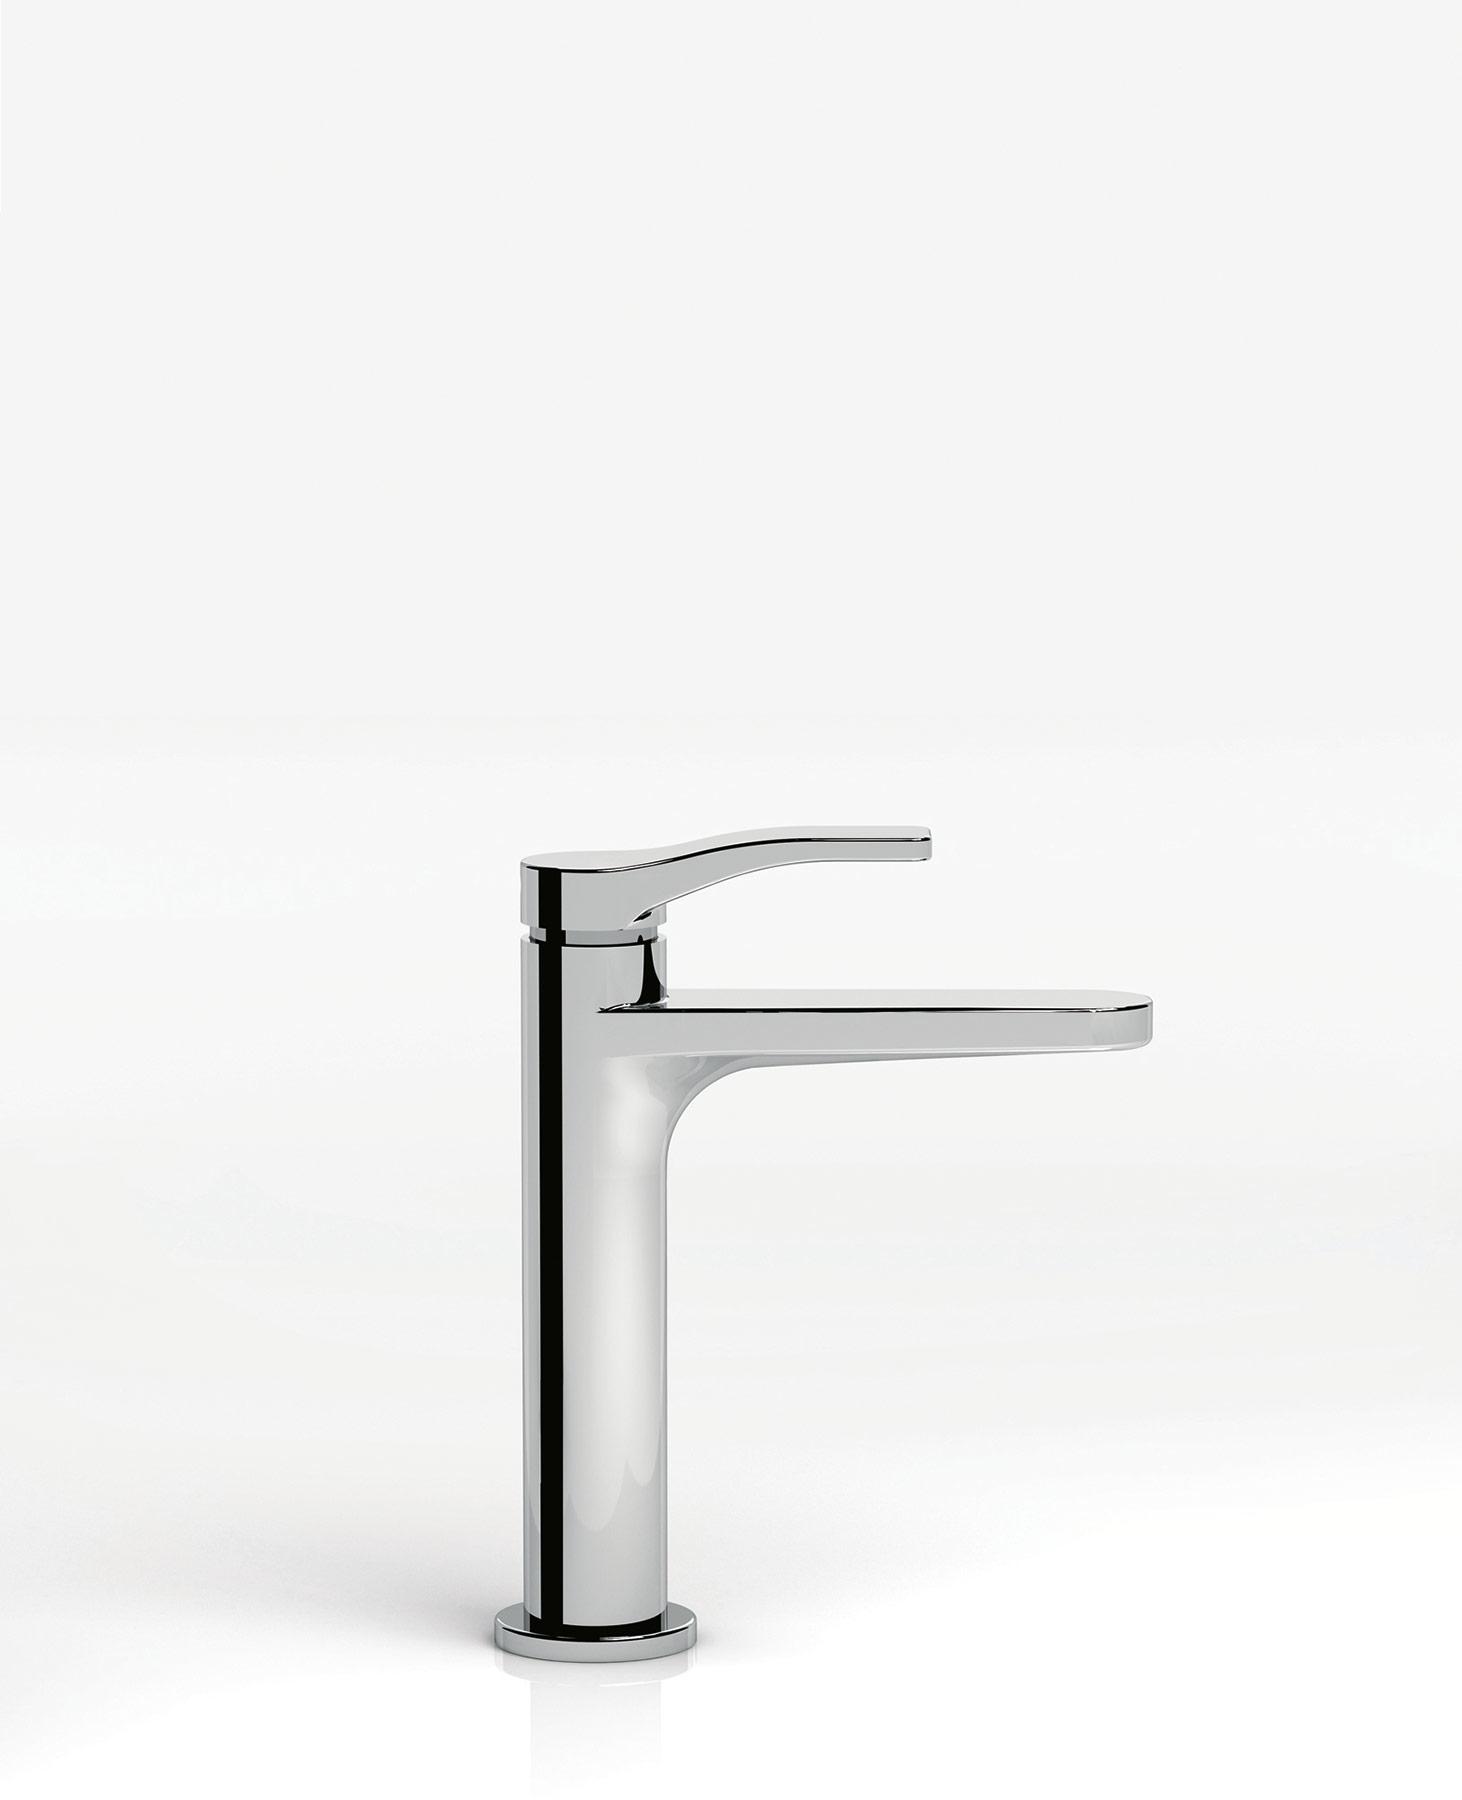 Modern Lissoni Deck Mount Faucet